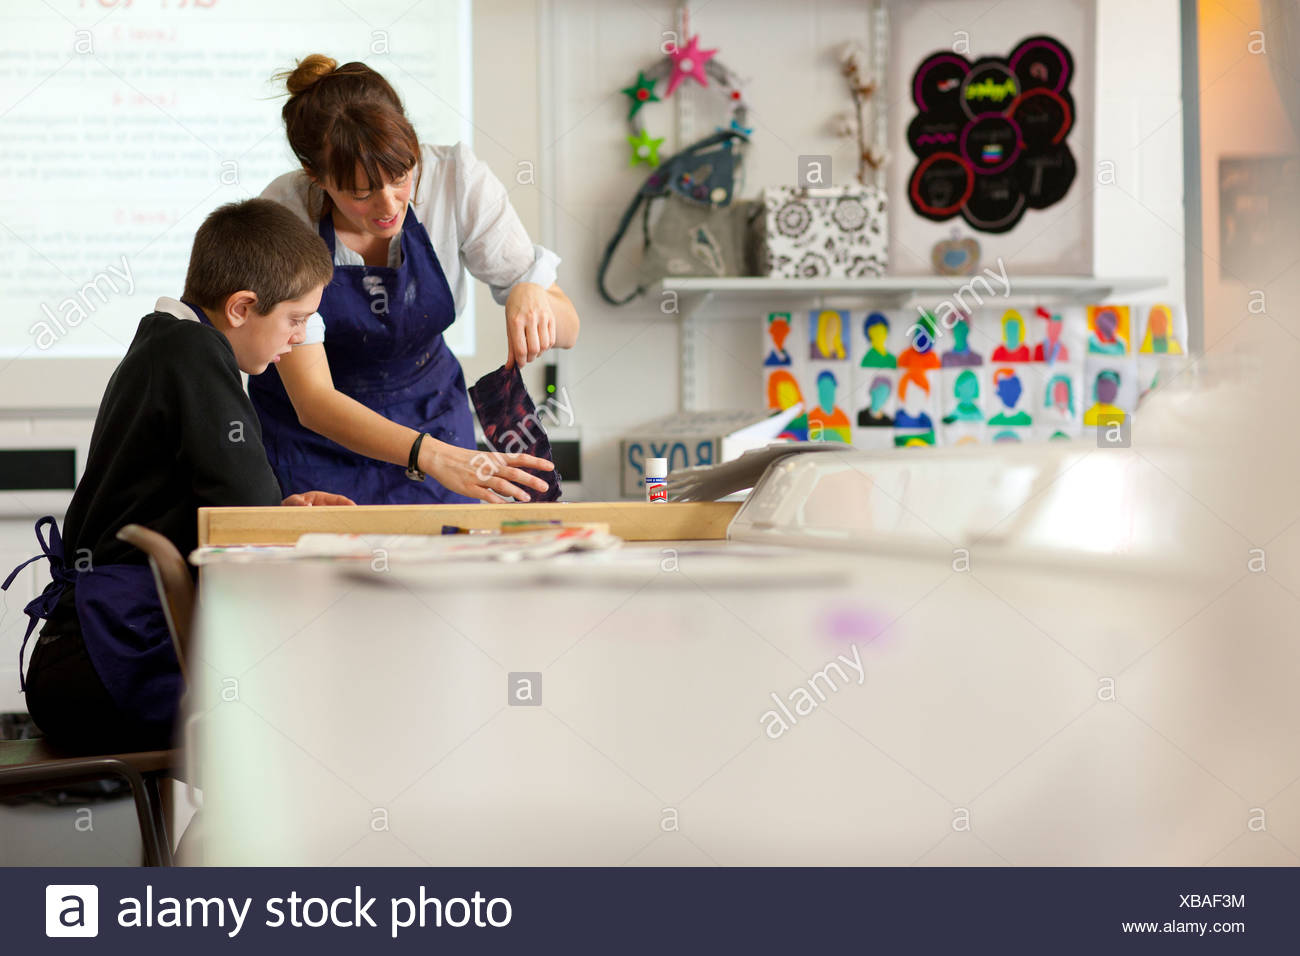 Teacher and student in school workshop - Stock Image